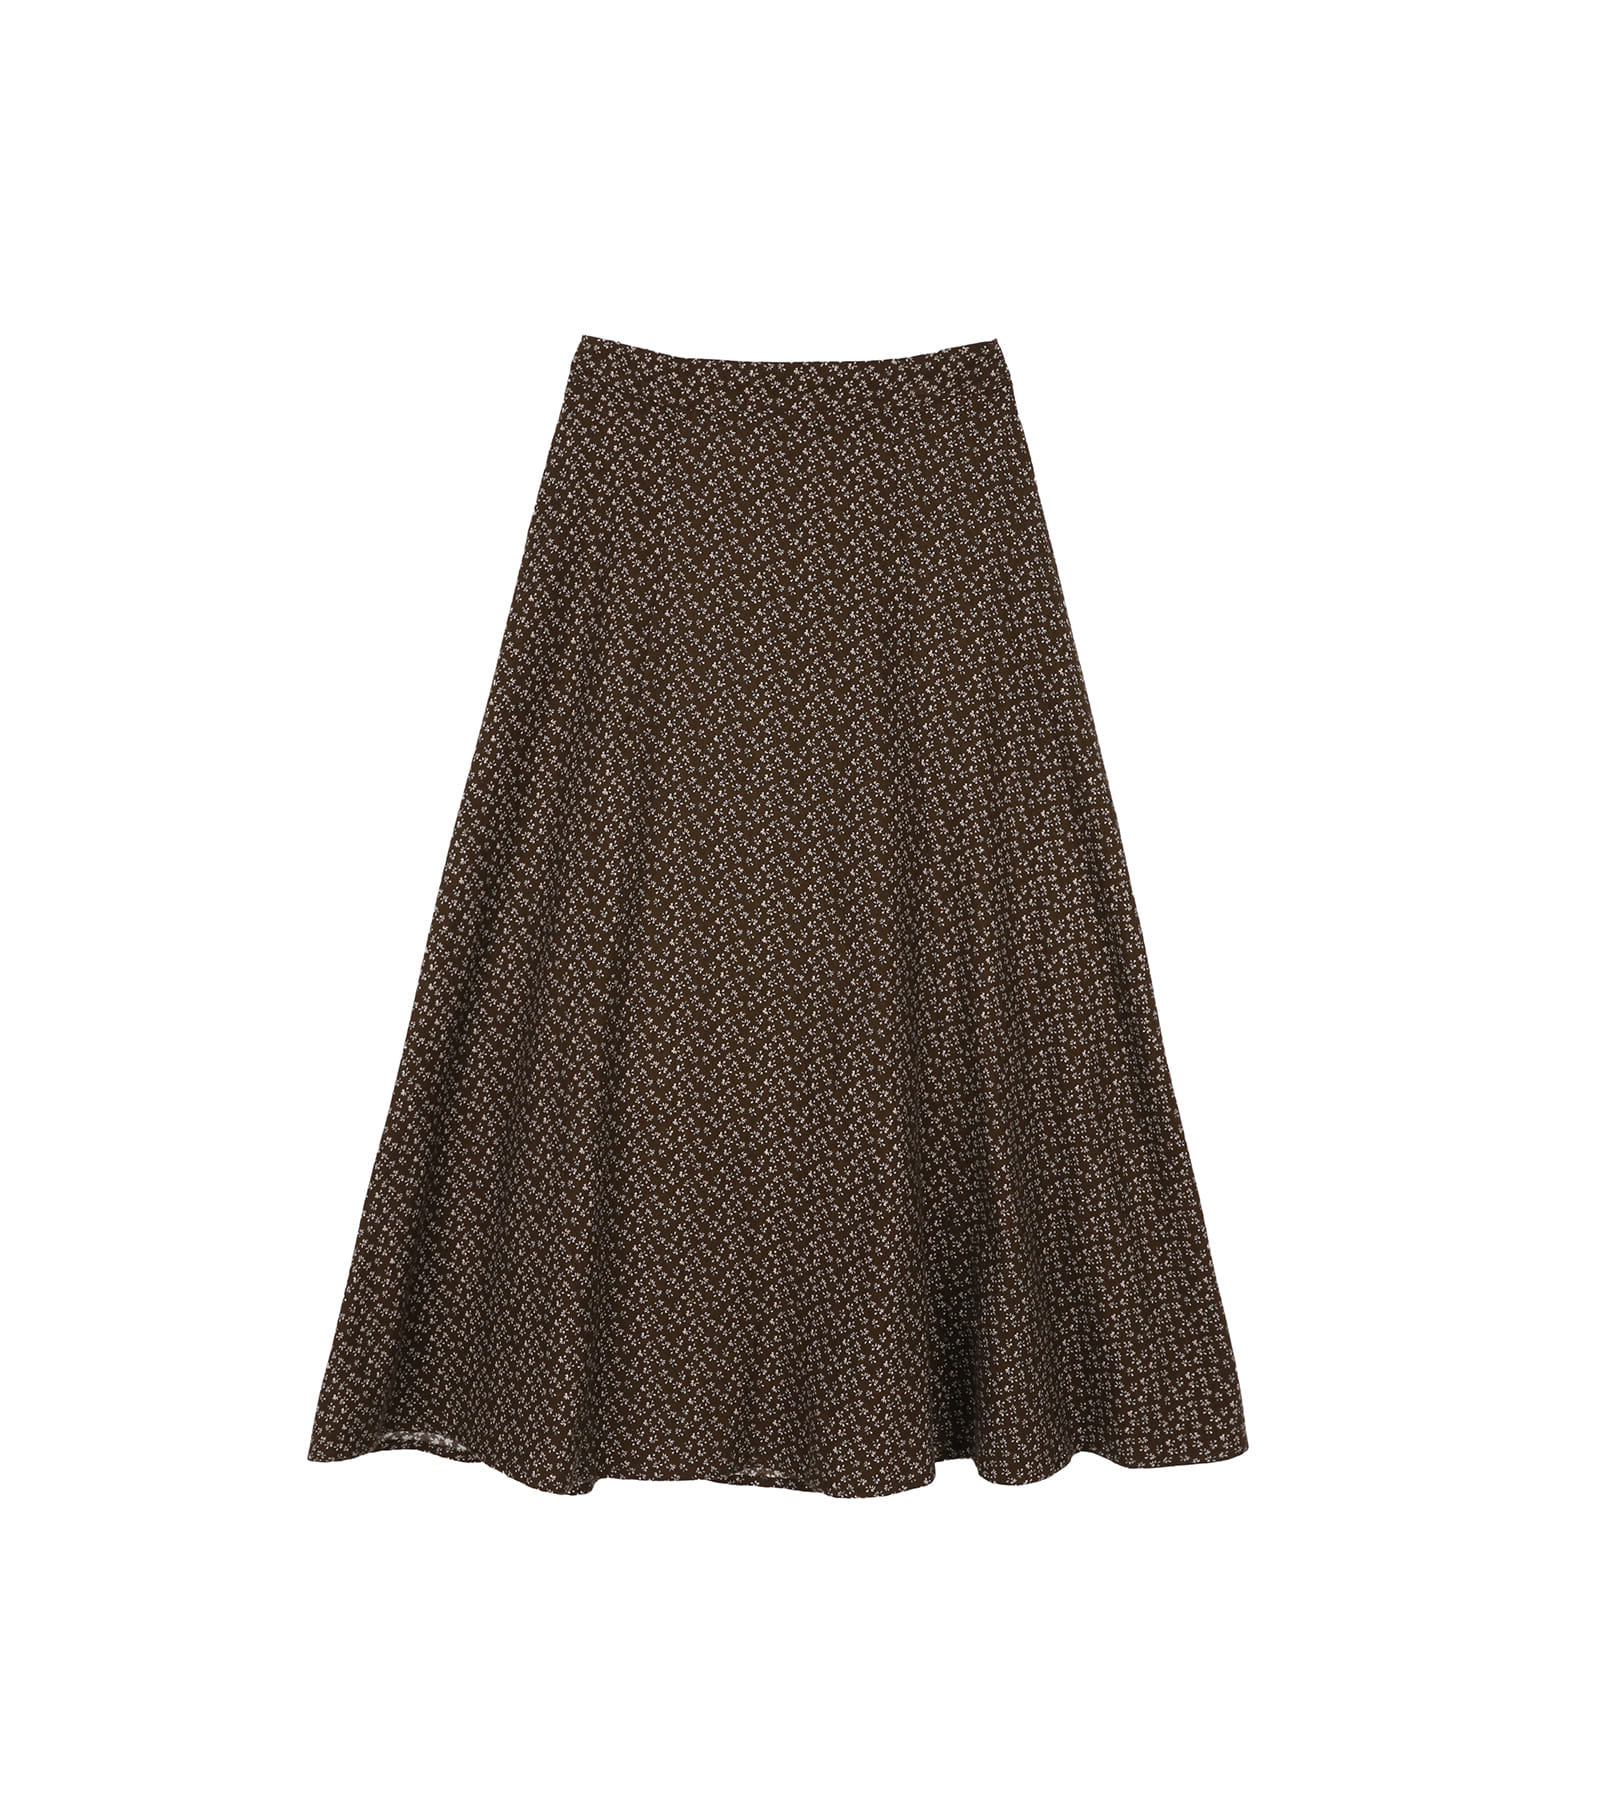 Florentine flower maxi skirt